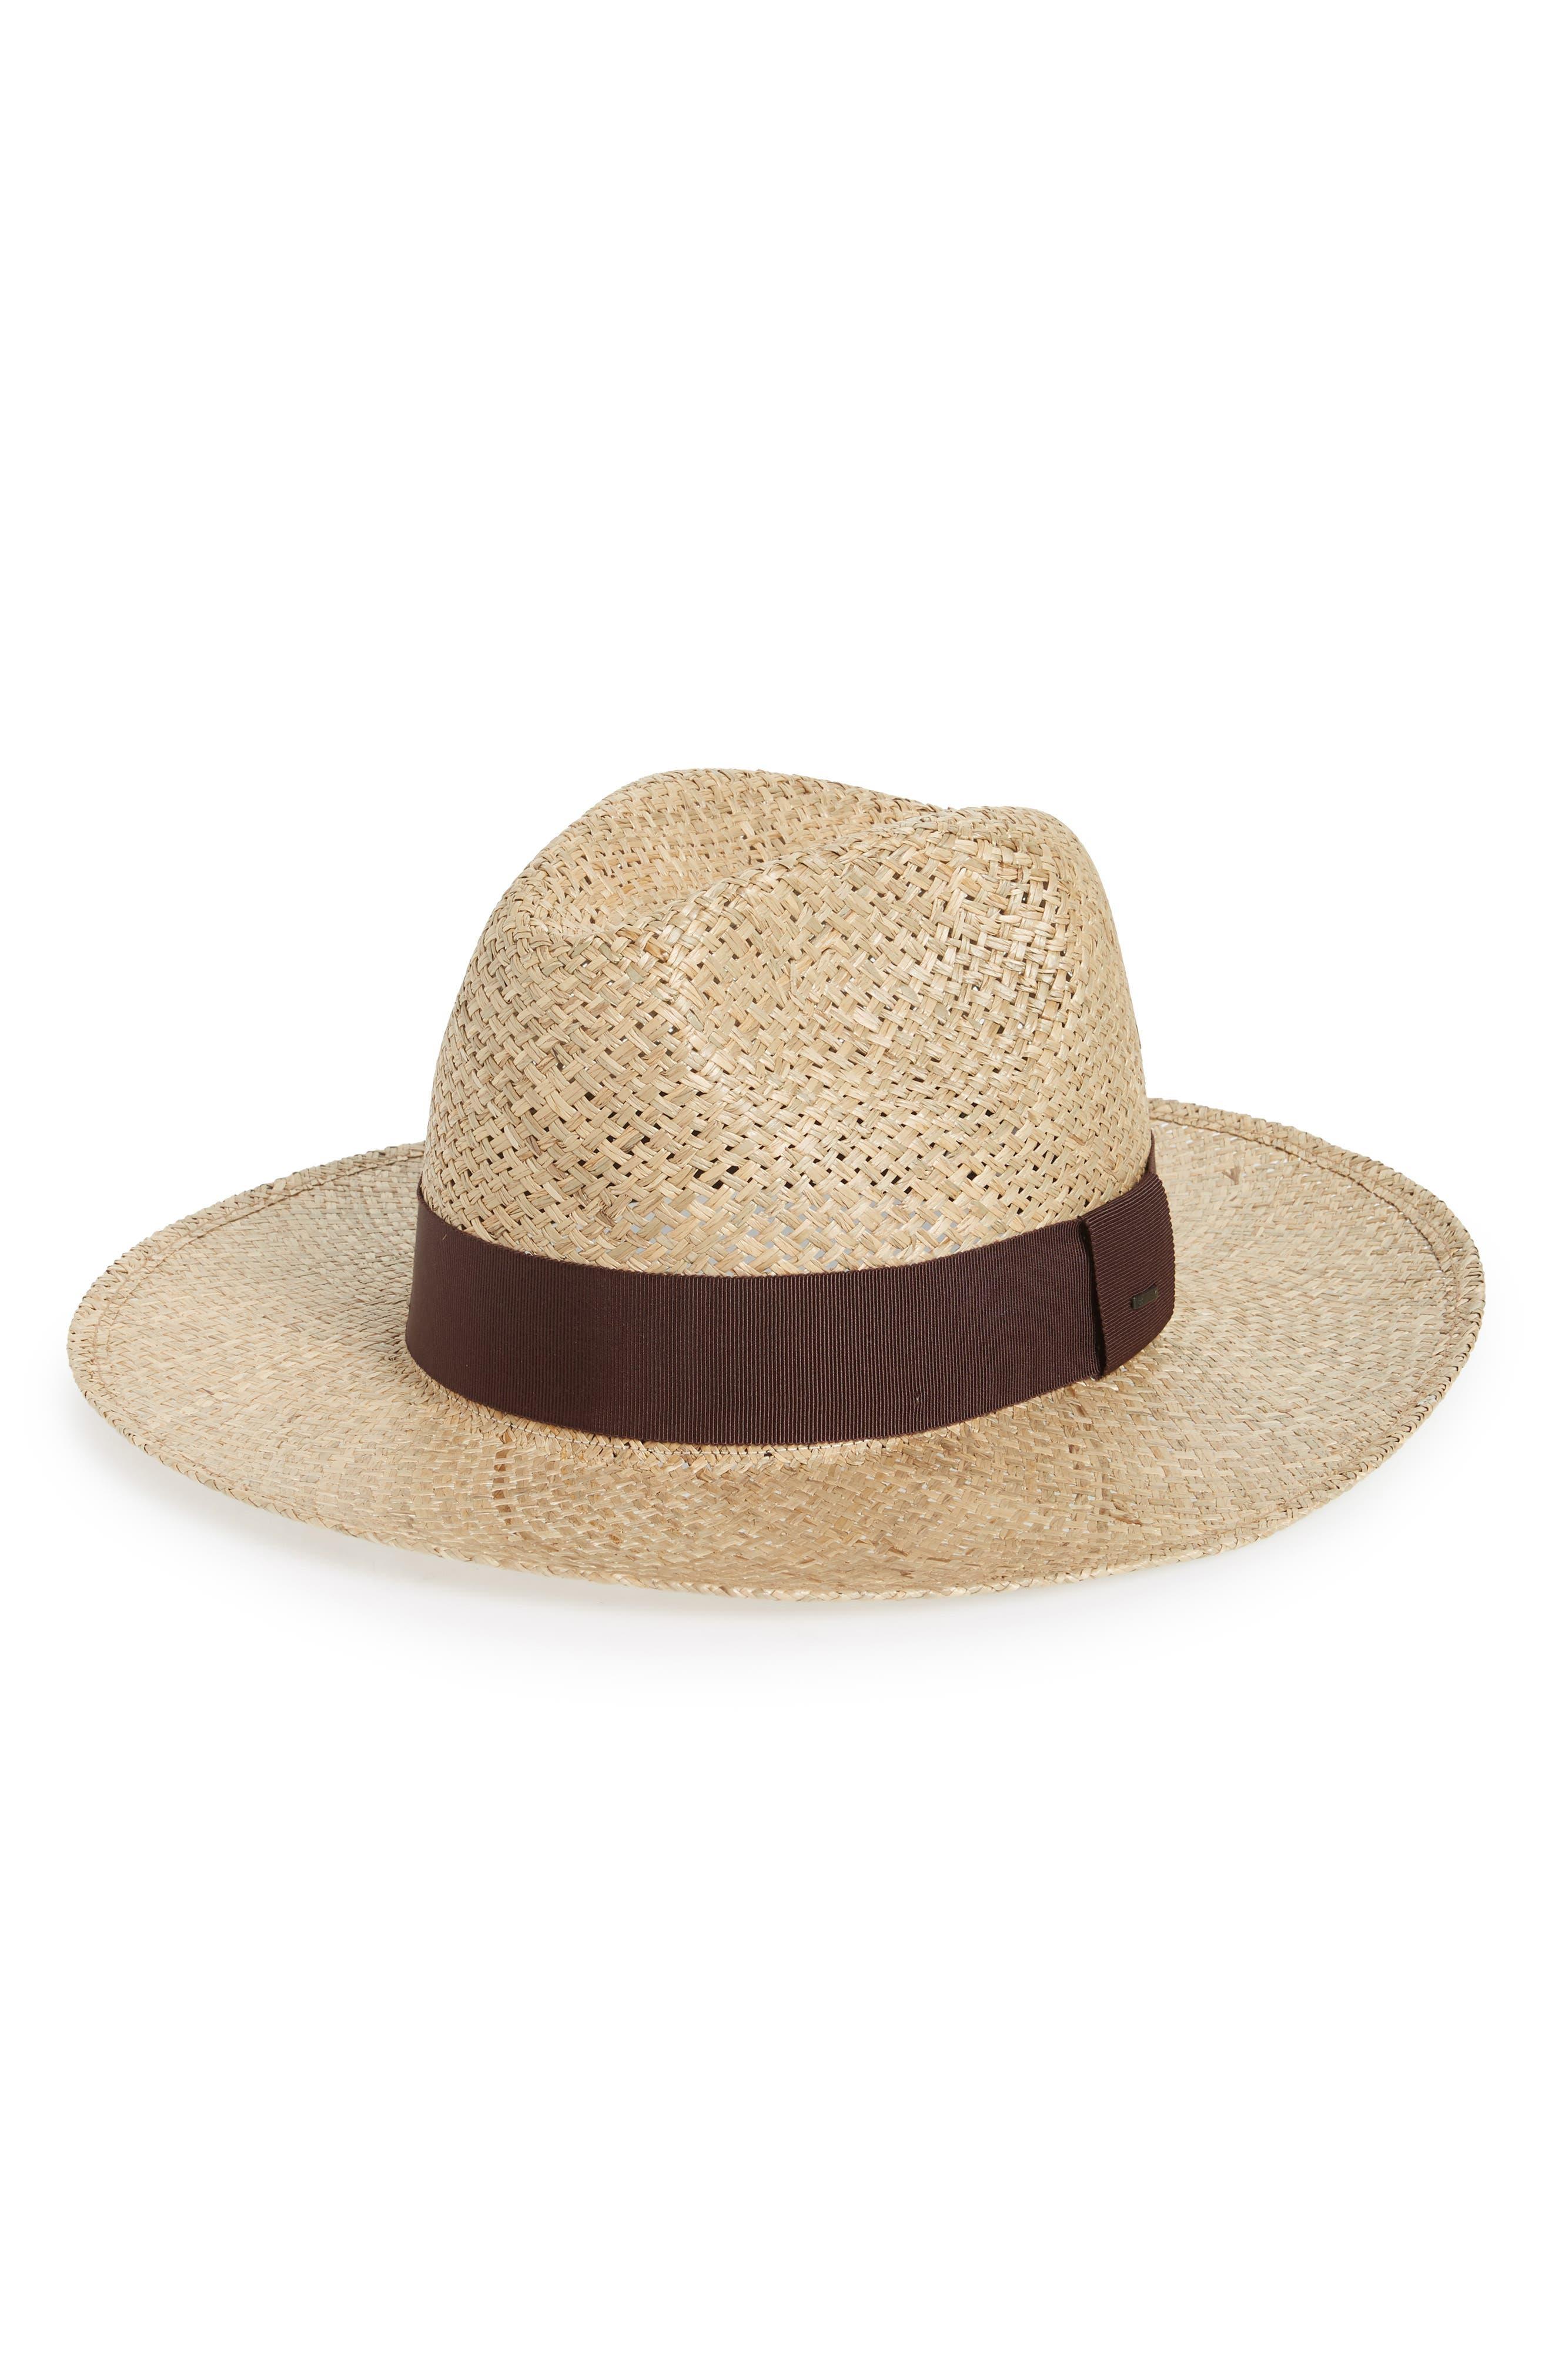 Kasmen Straw Hat,                             Main thumbnail 1, color,